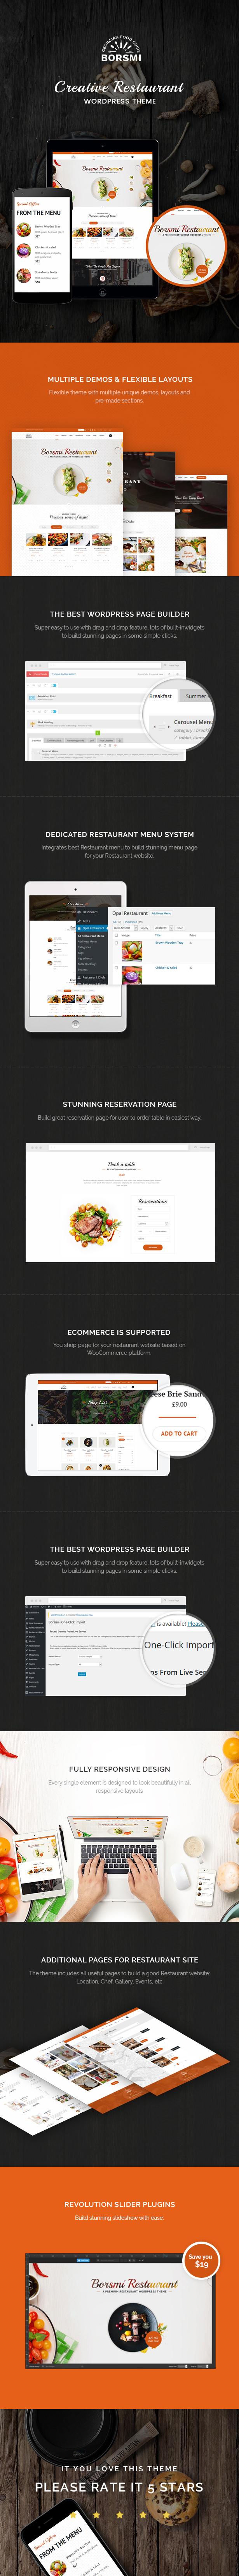 Woocommerce wordpress theme for real estate